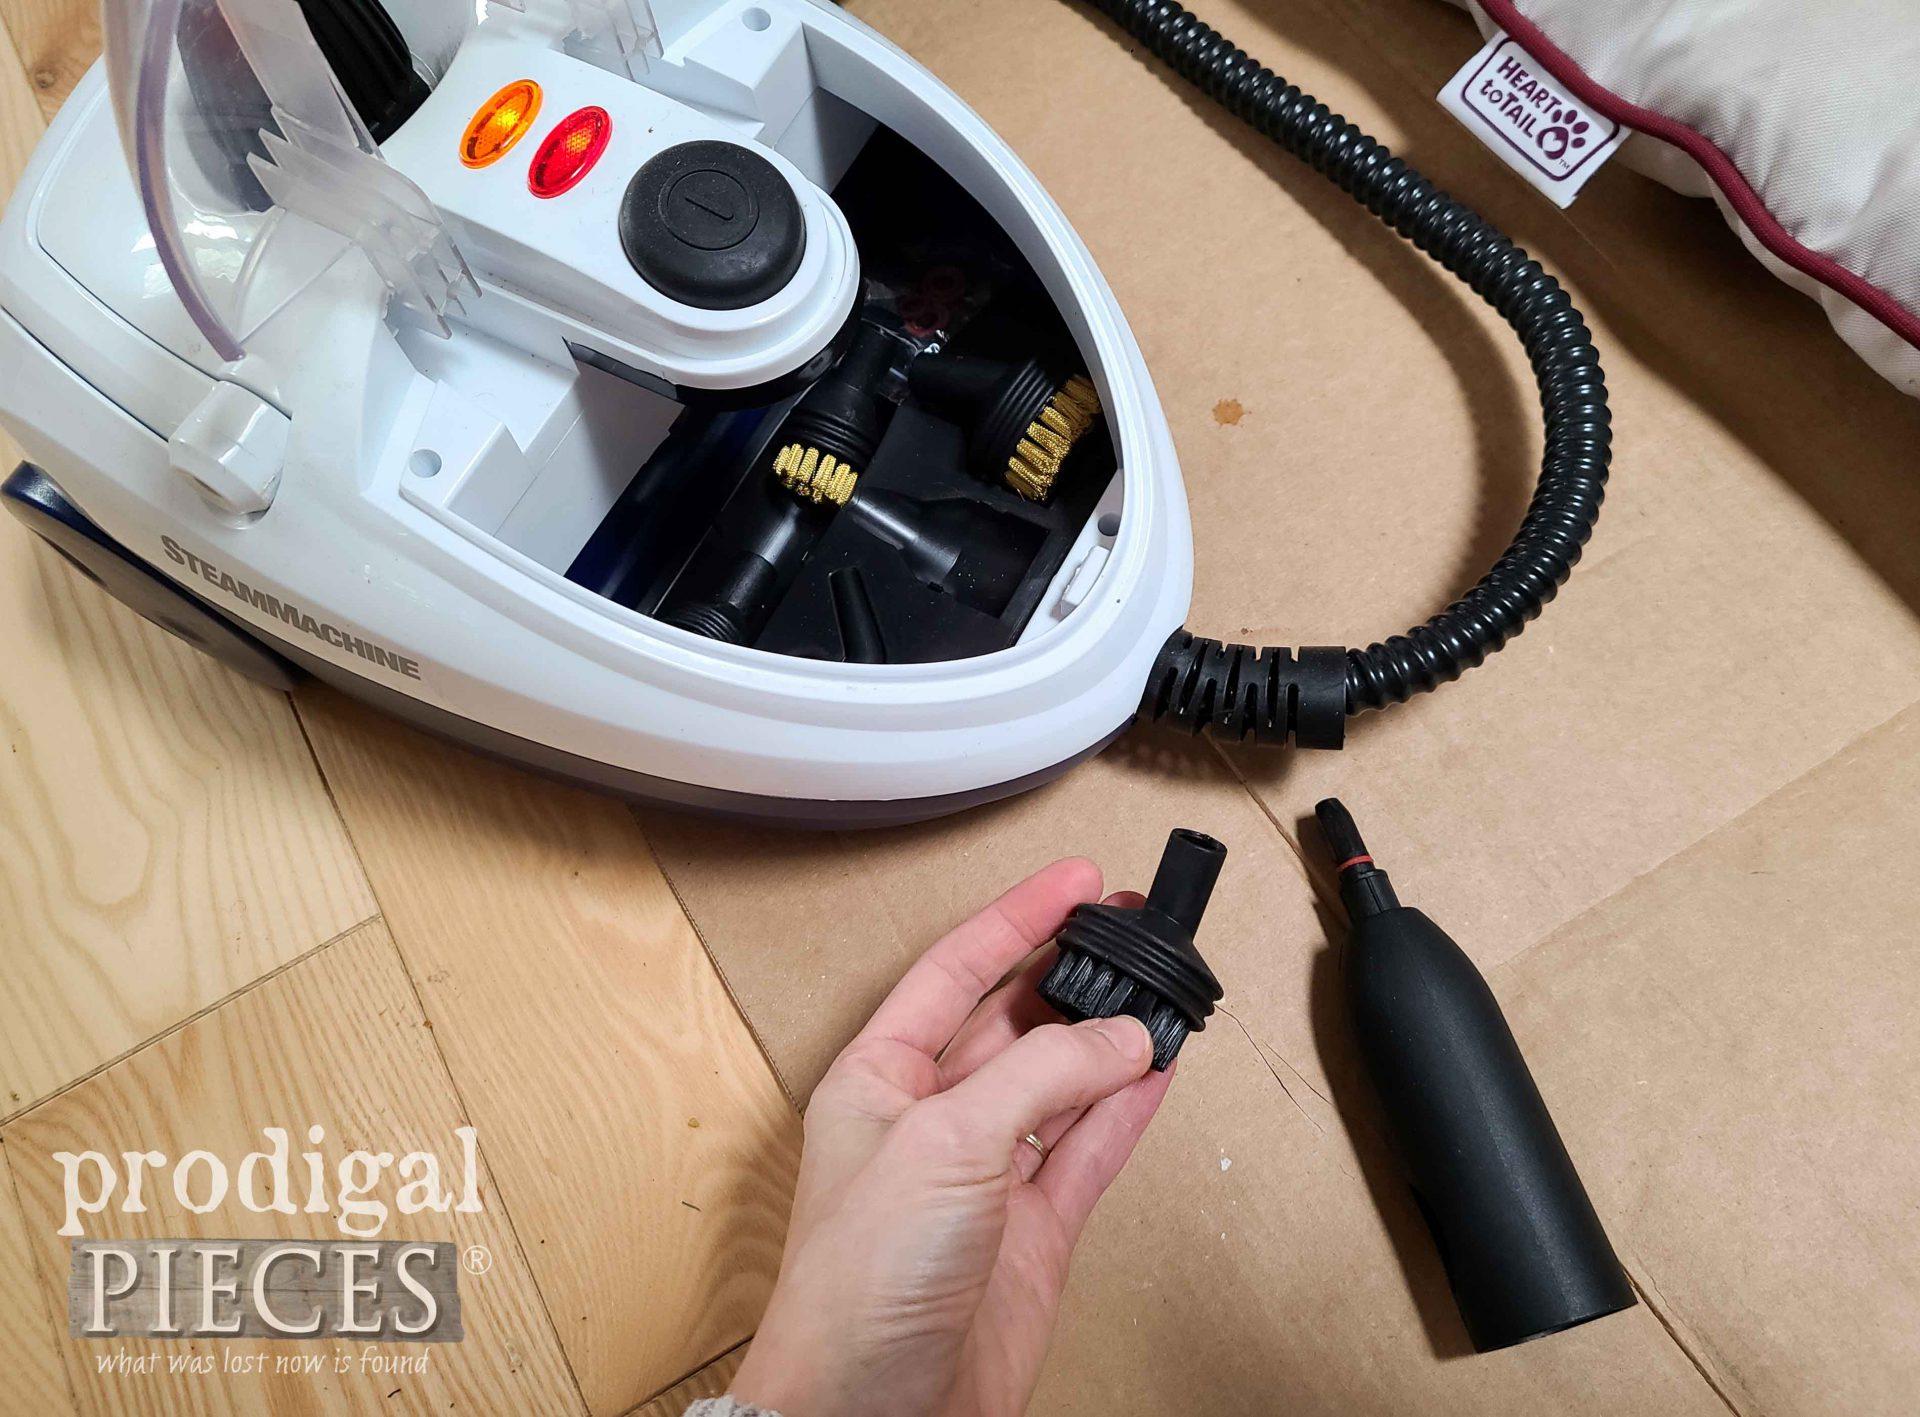 HomeRight SteamMachine Attachments | prodigalpieces.com #prodigalpieces